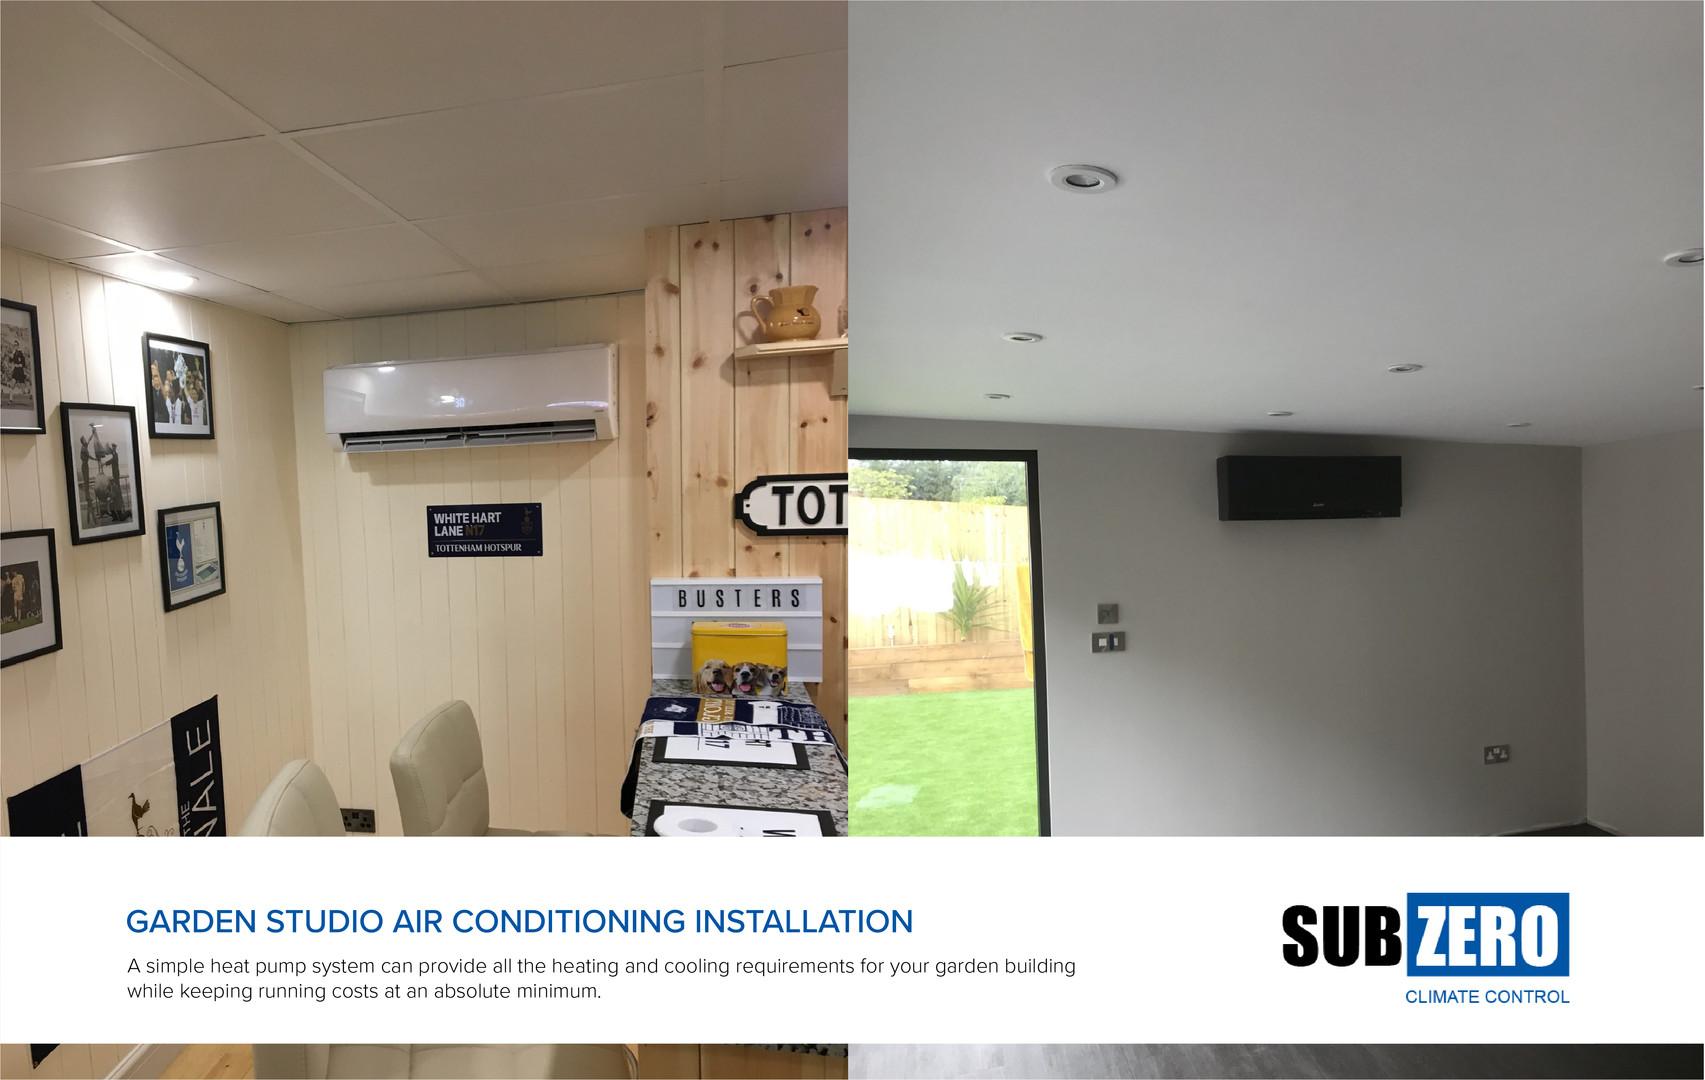 Garden Studio Air Conditioning.jpg